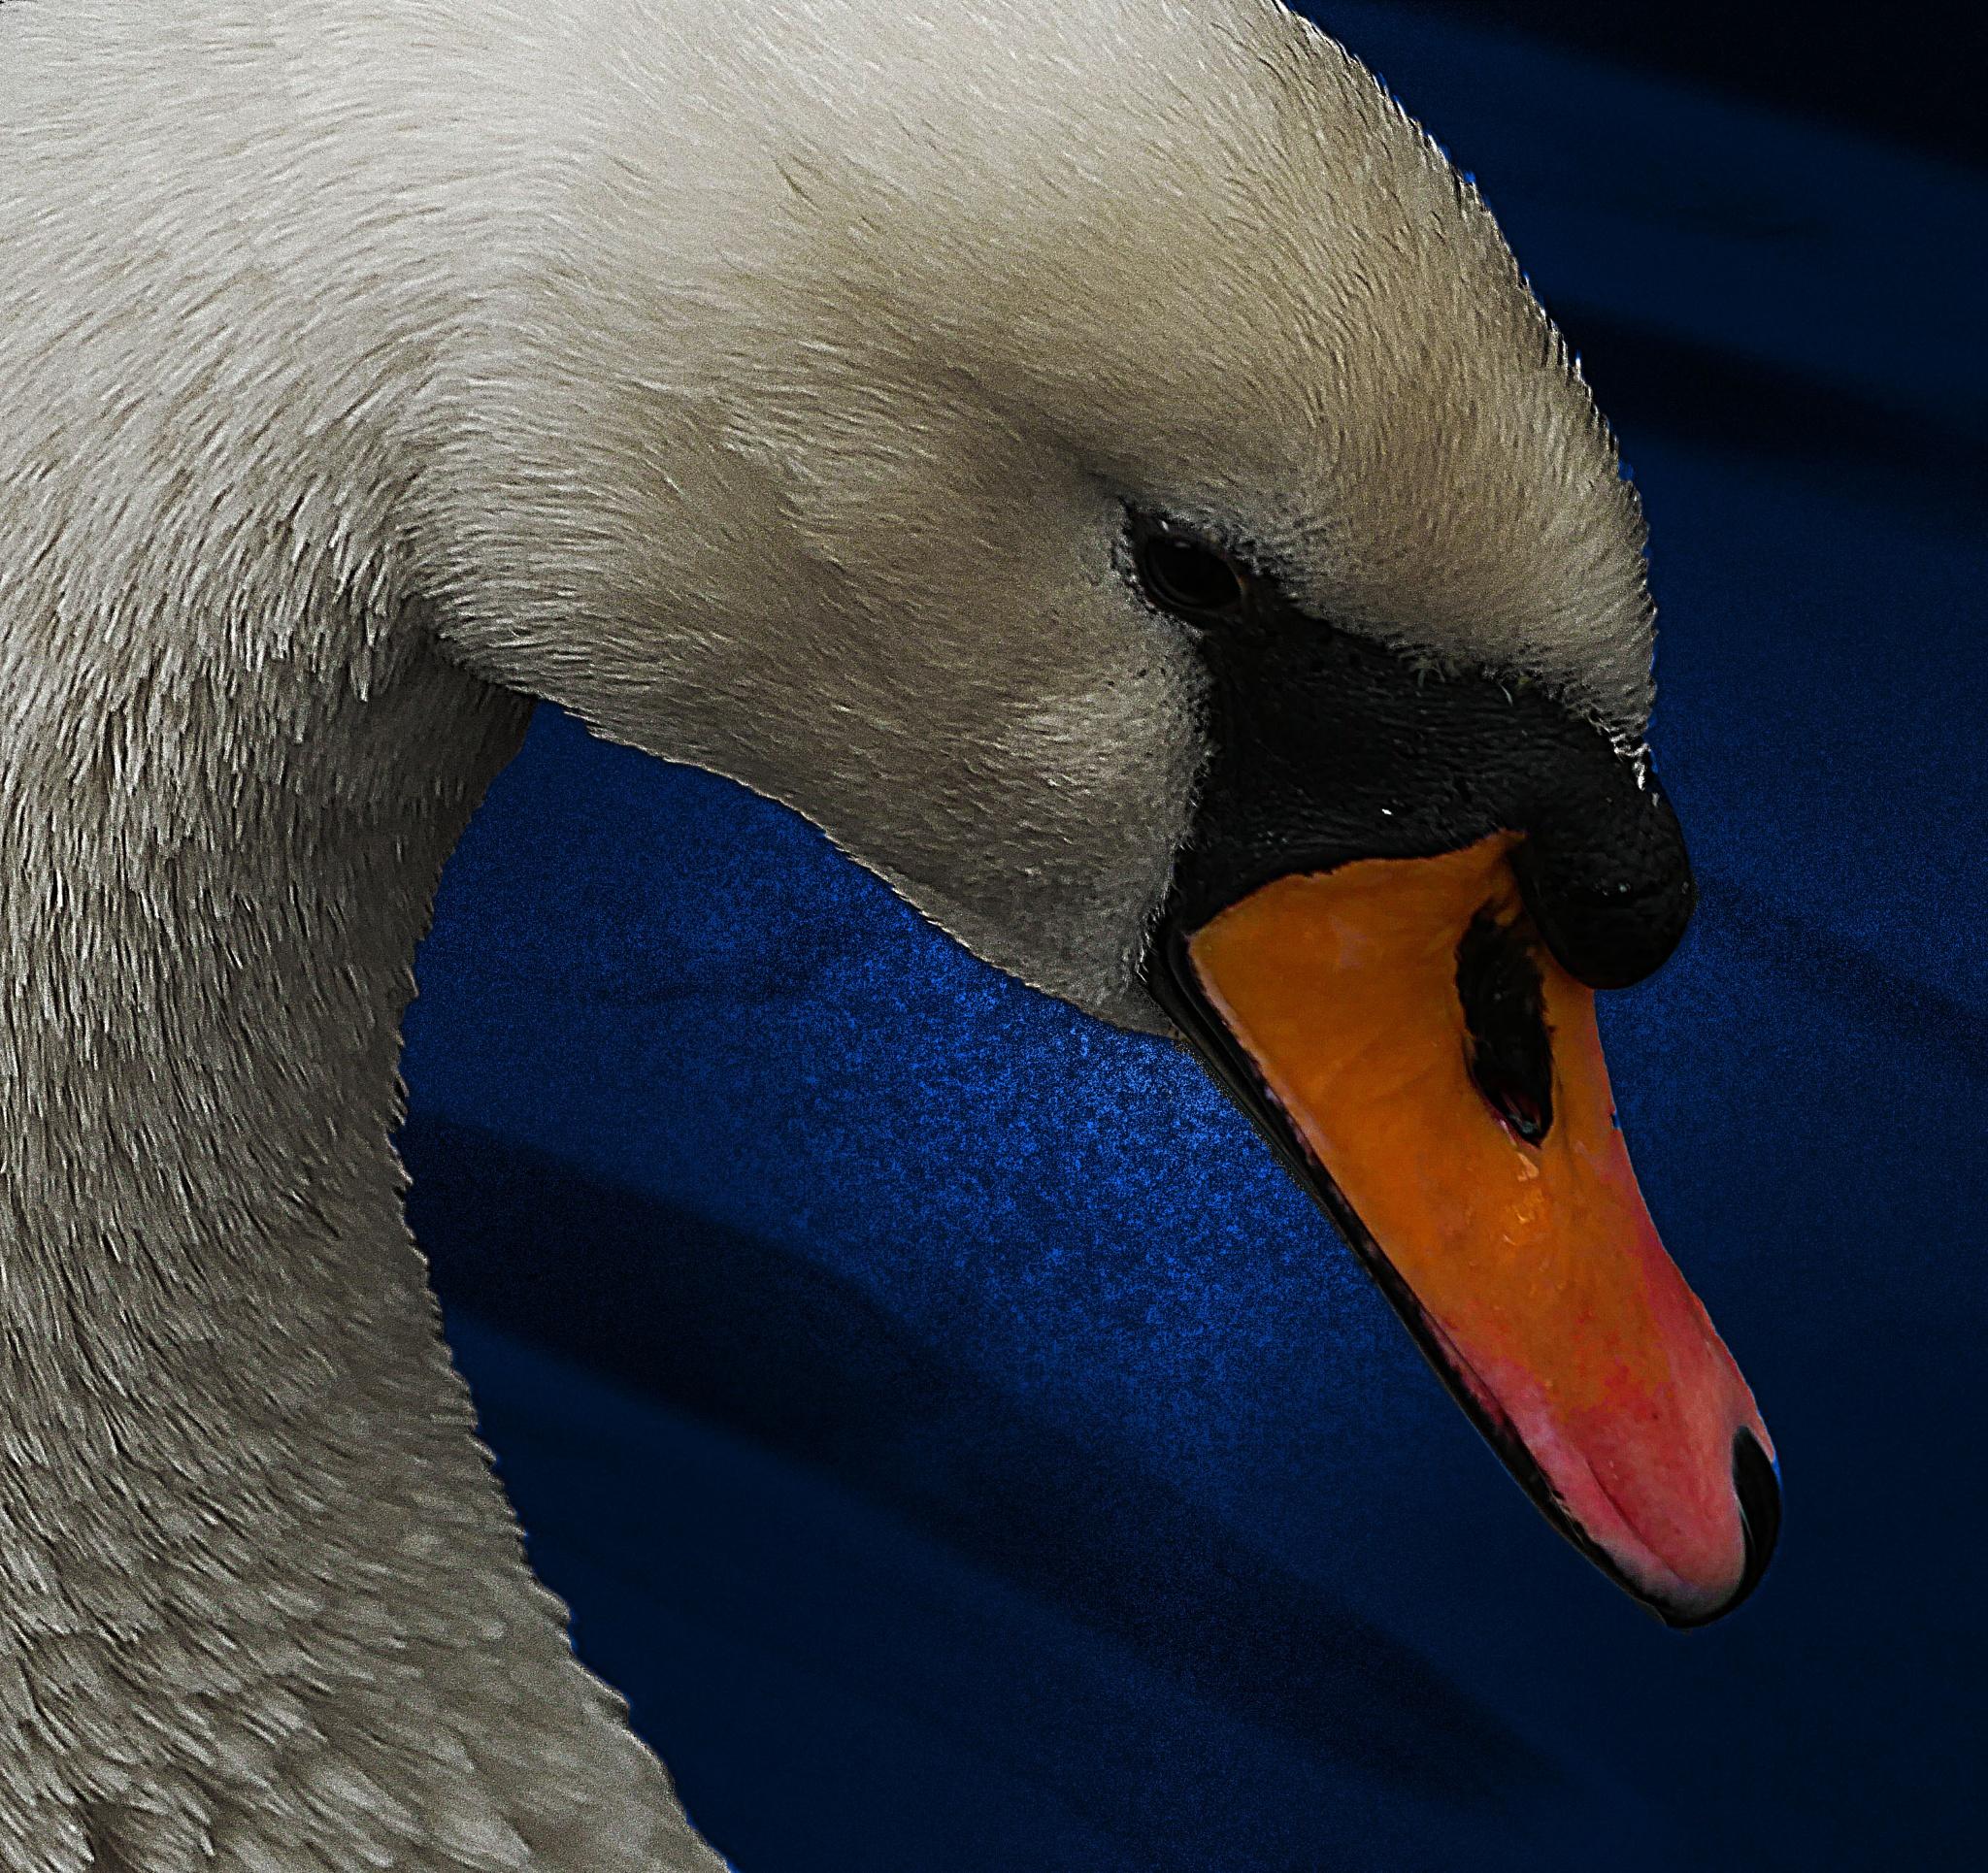 Swan by sreten nakićenović